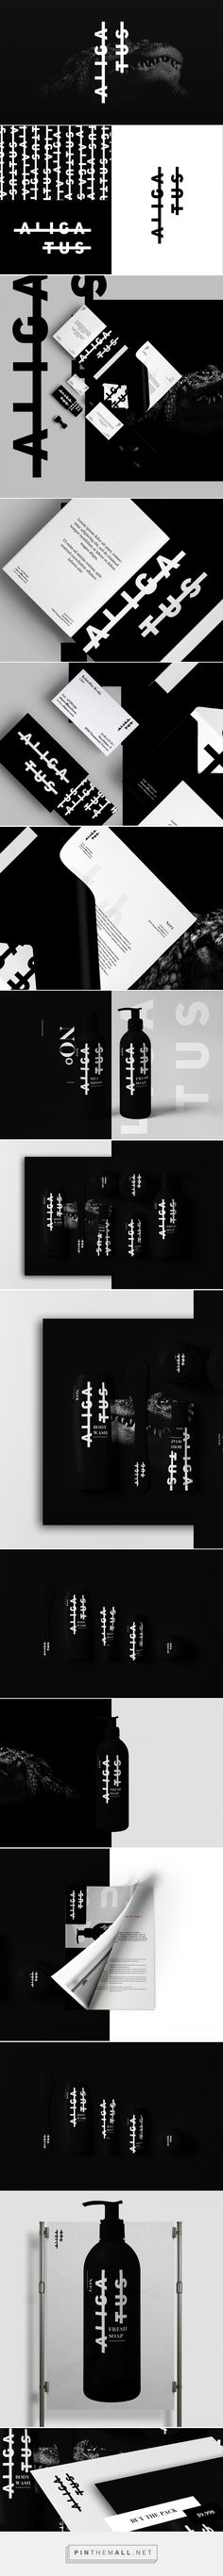 Aligatus Branding and Packaging by Kristoffer Kvale on Behance | Fivestar Branding – Design and Branding Agency & Inspiration Gallery